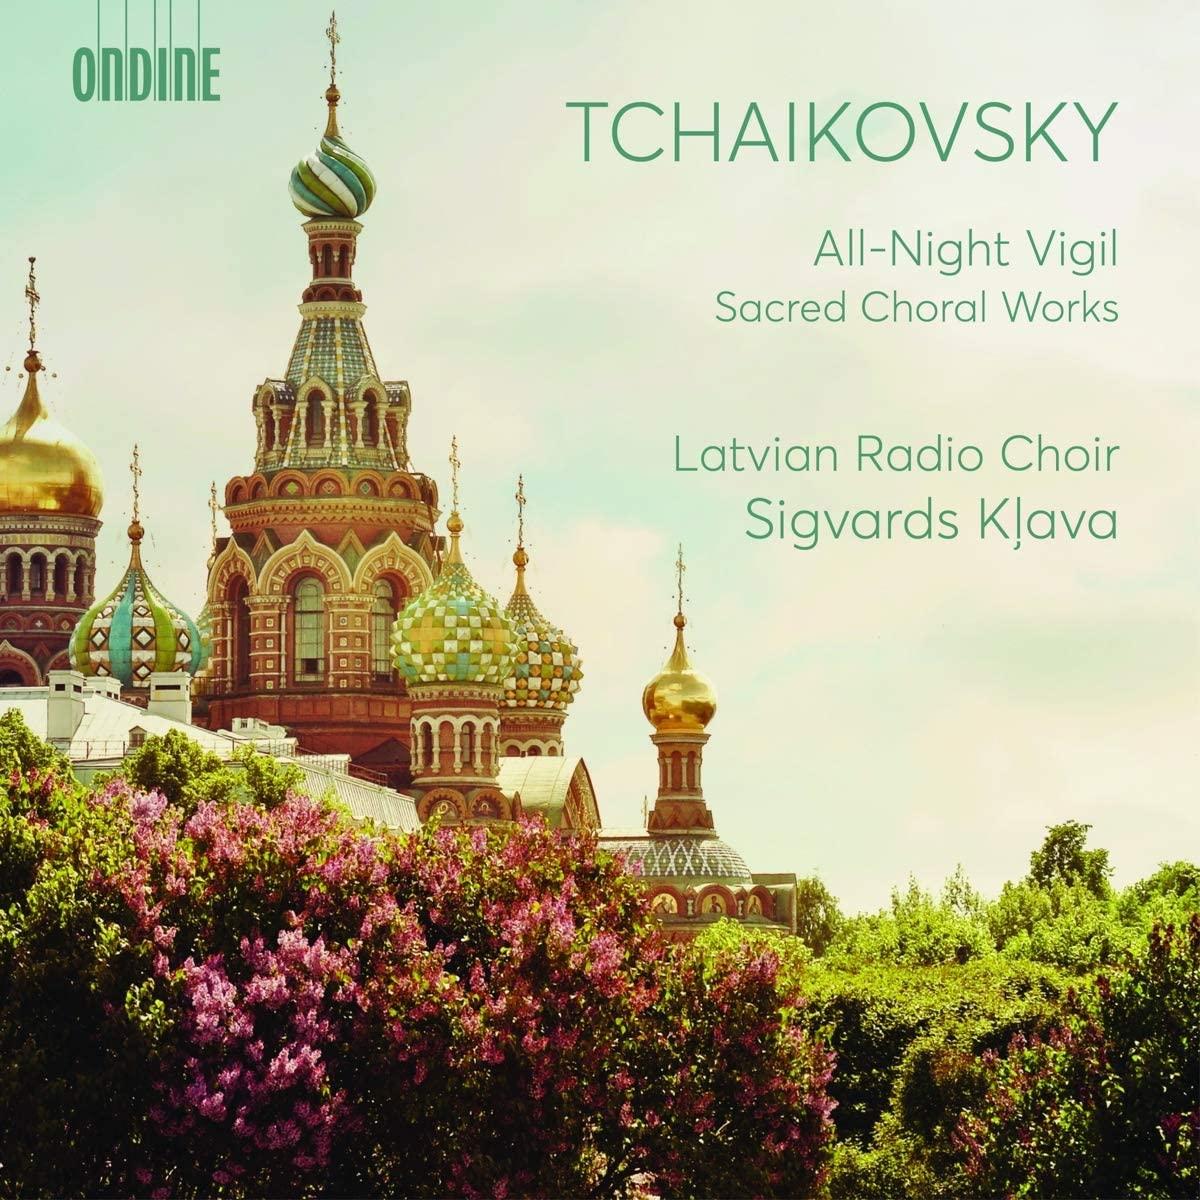 Review of TCHAIKOVSKY All-Night Vigil (Kjava)